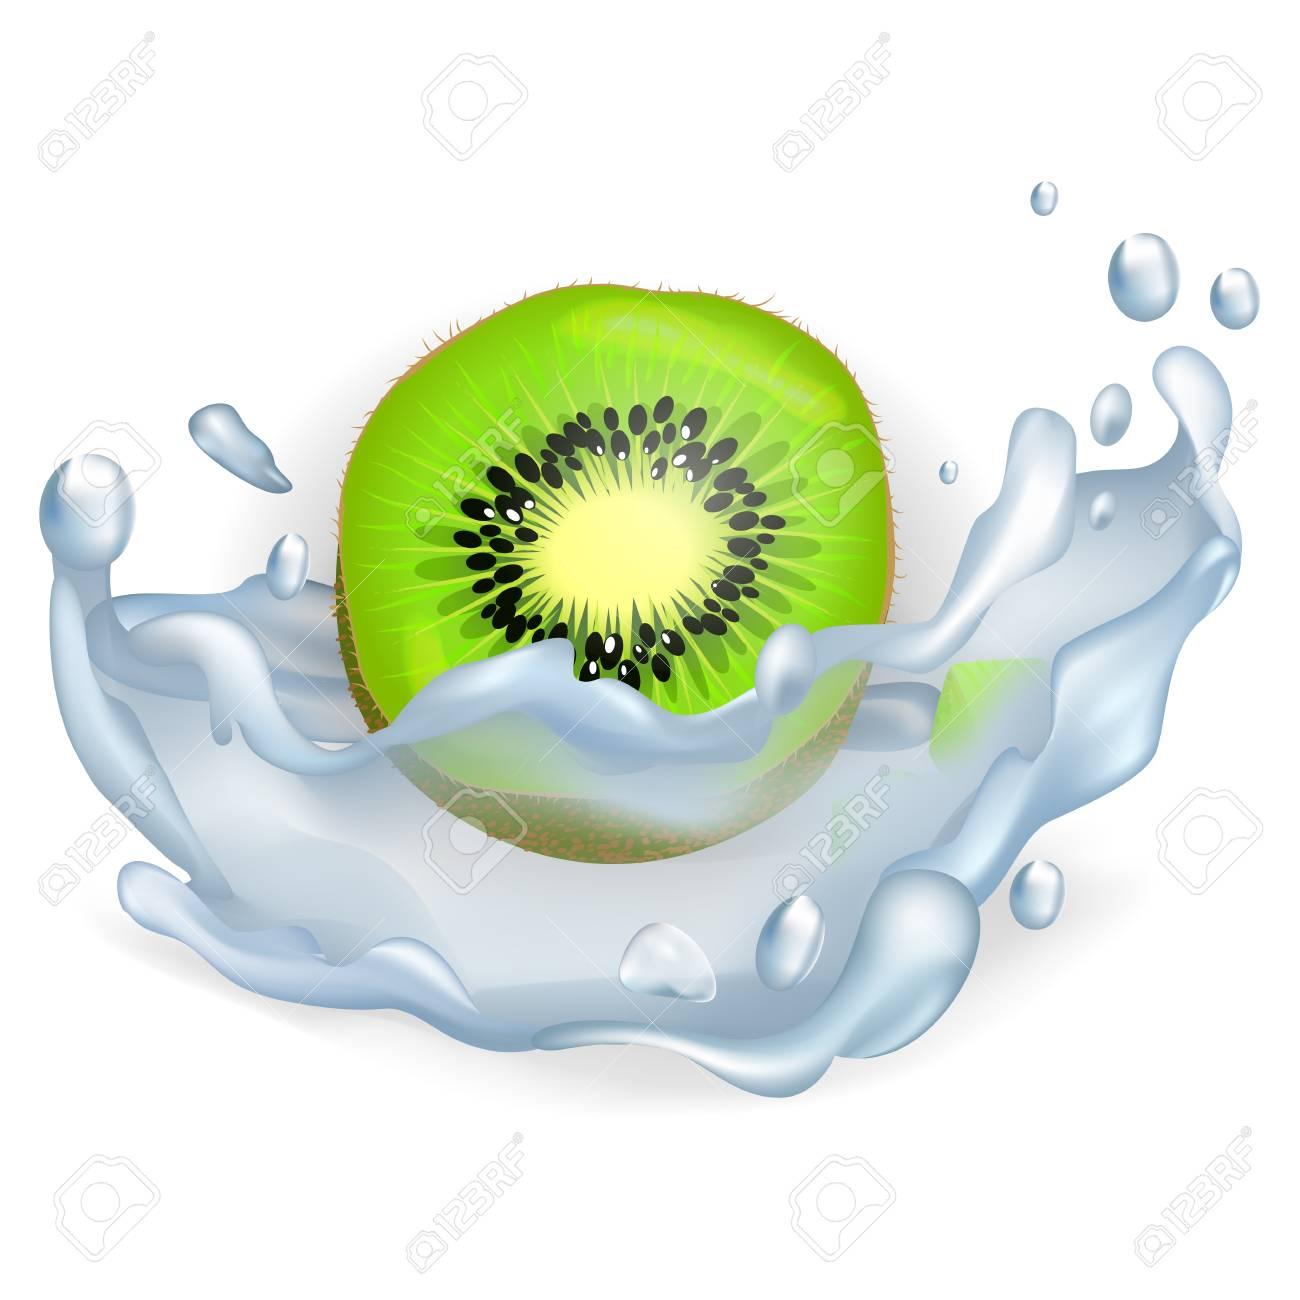 Green Slice of Kiwi Fruit in Water Splash Closeup Stock Vector - 87289147